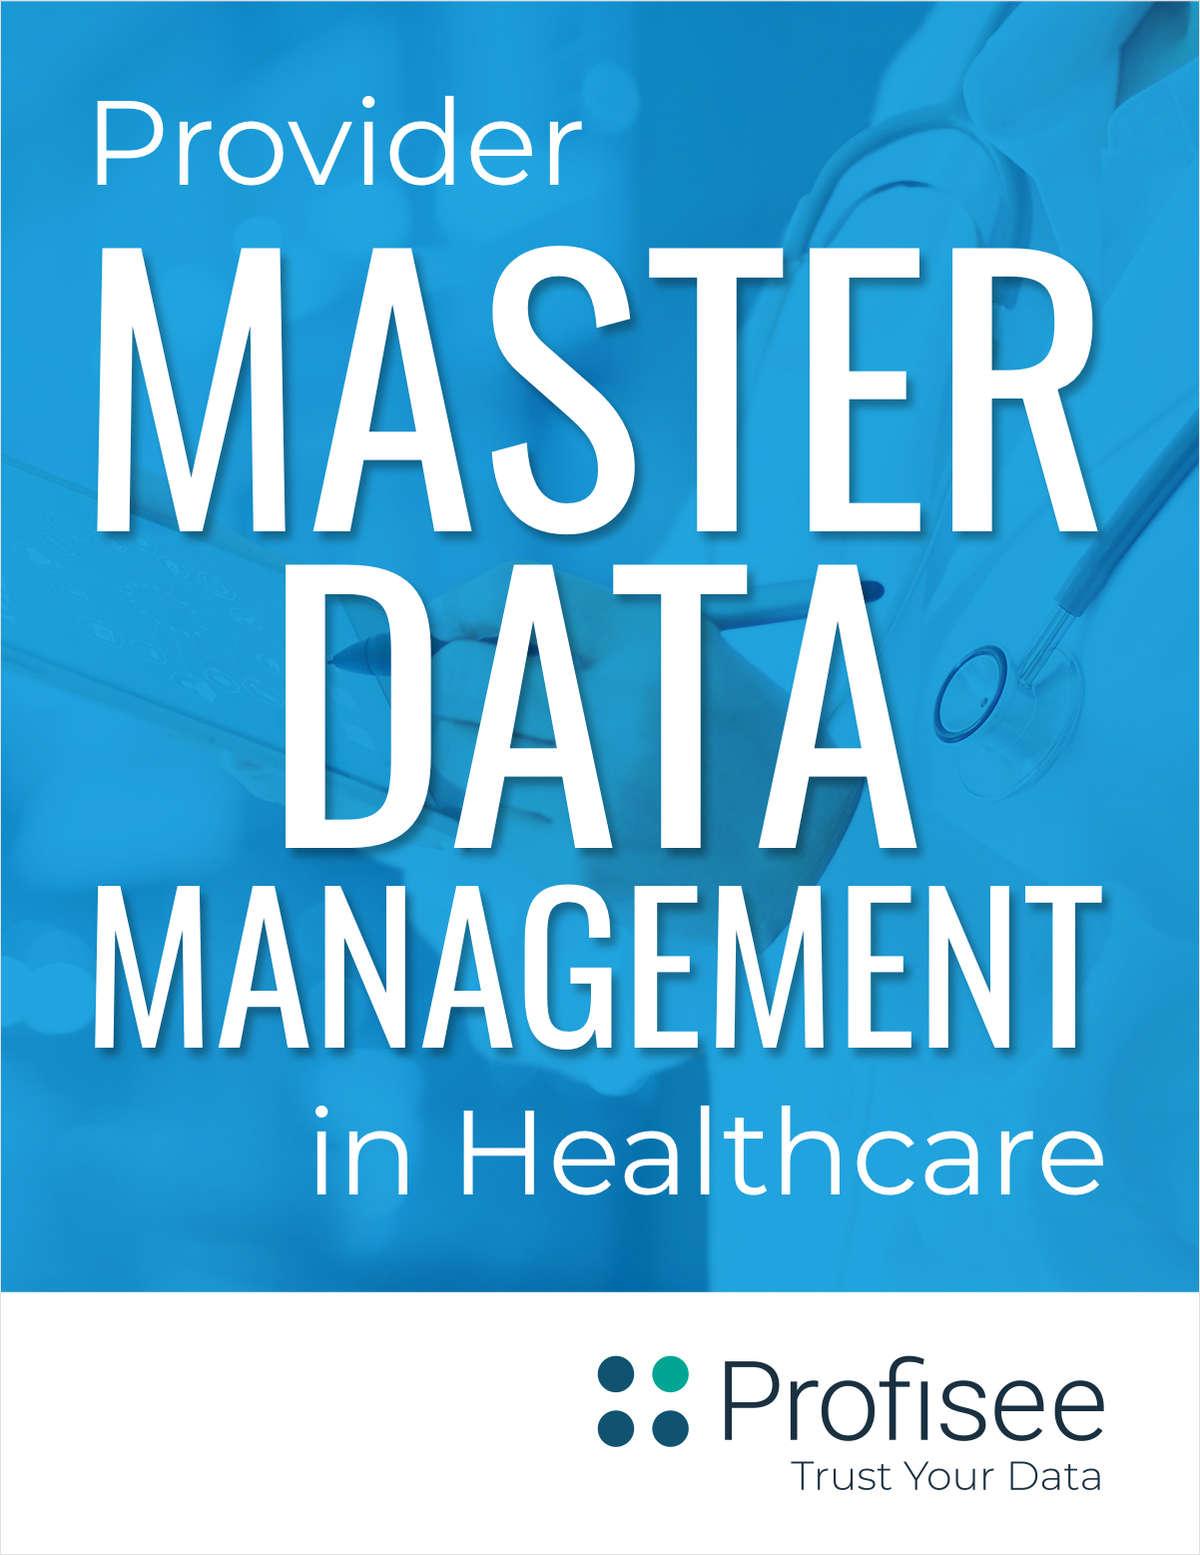 How Provider Master Data Management Helps Streamline Healthcare Organizations